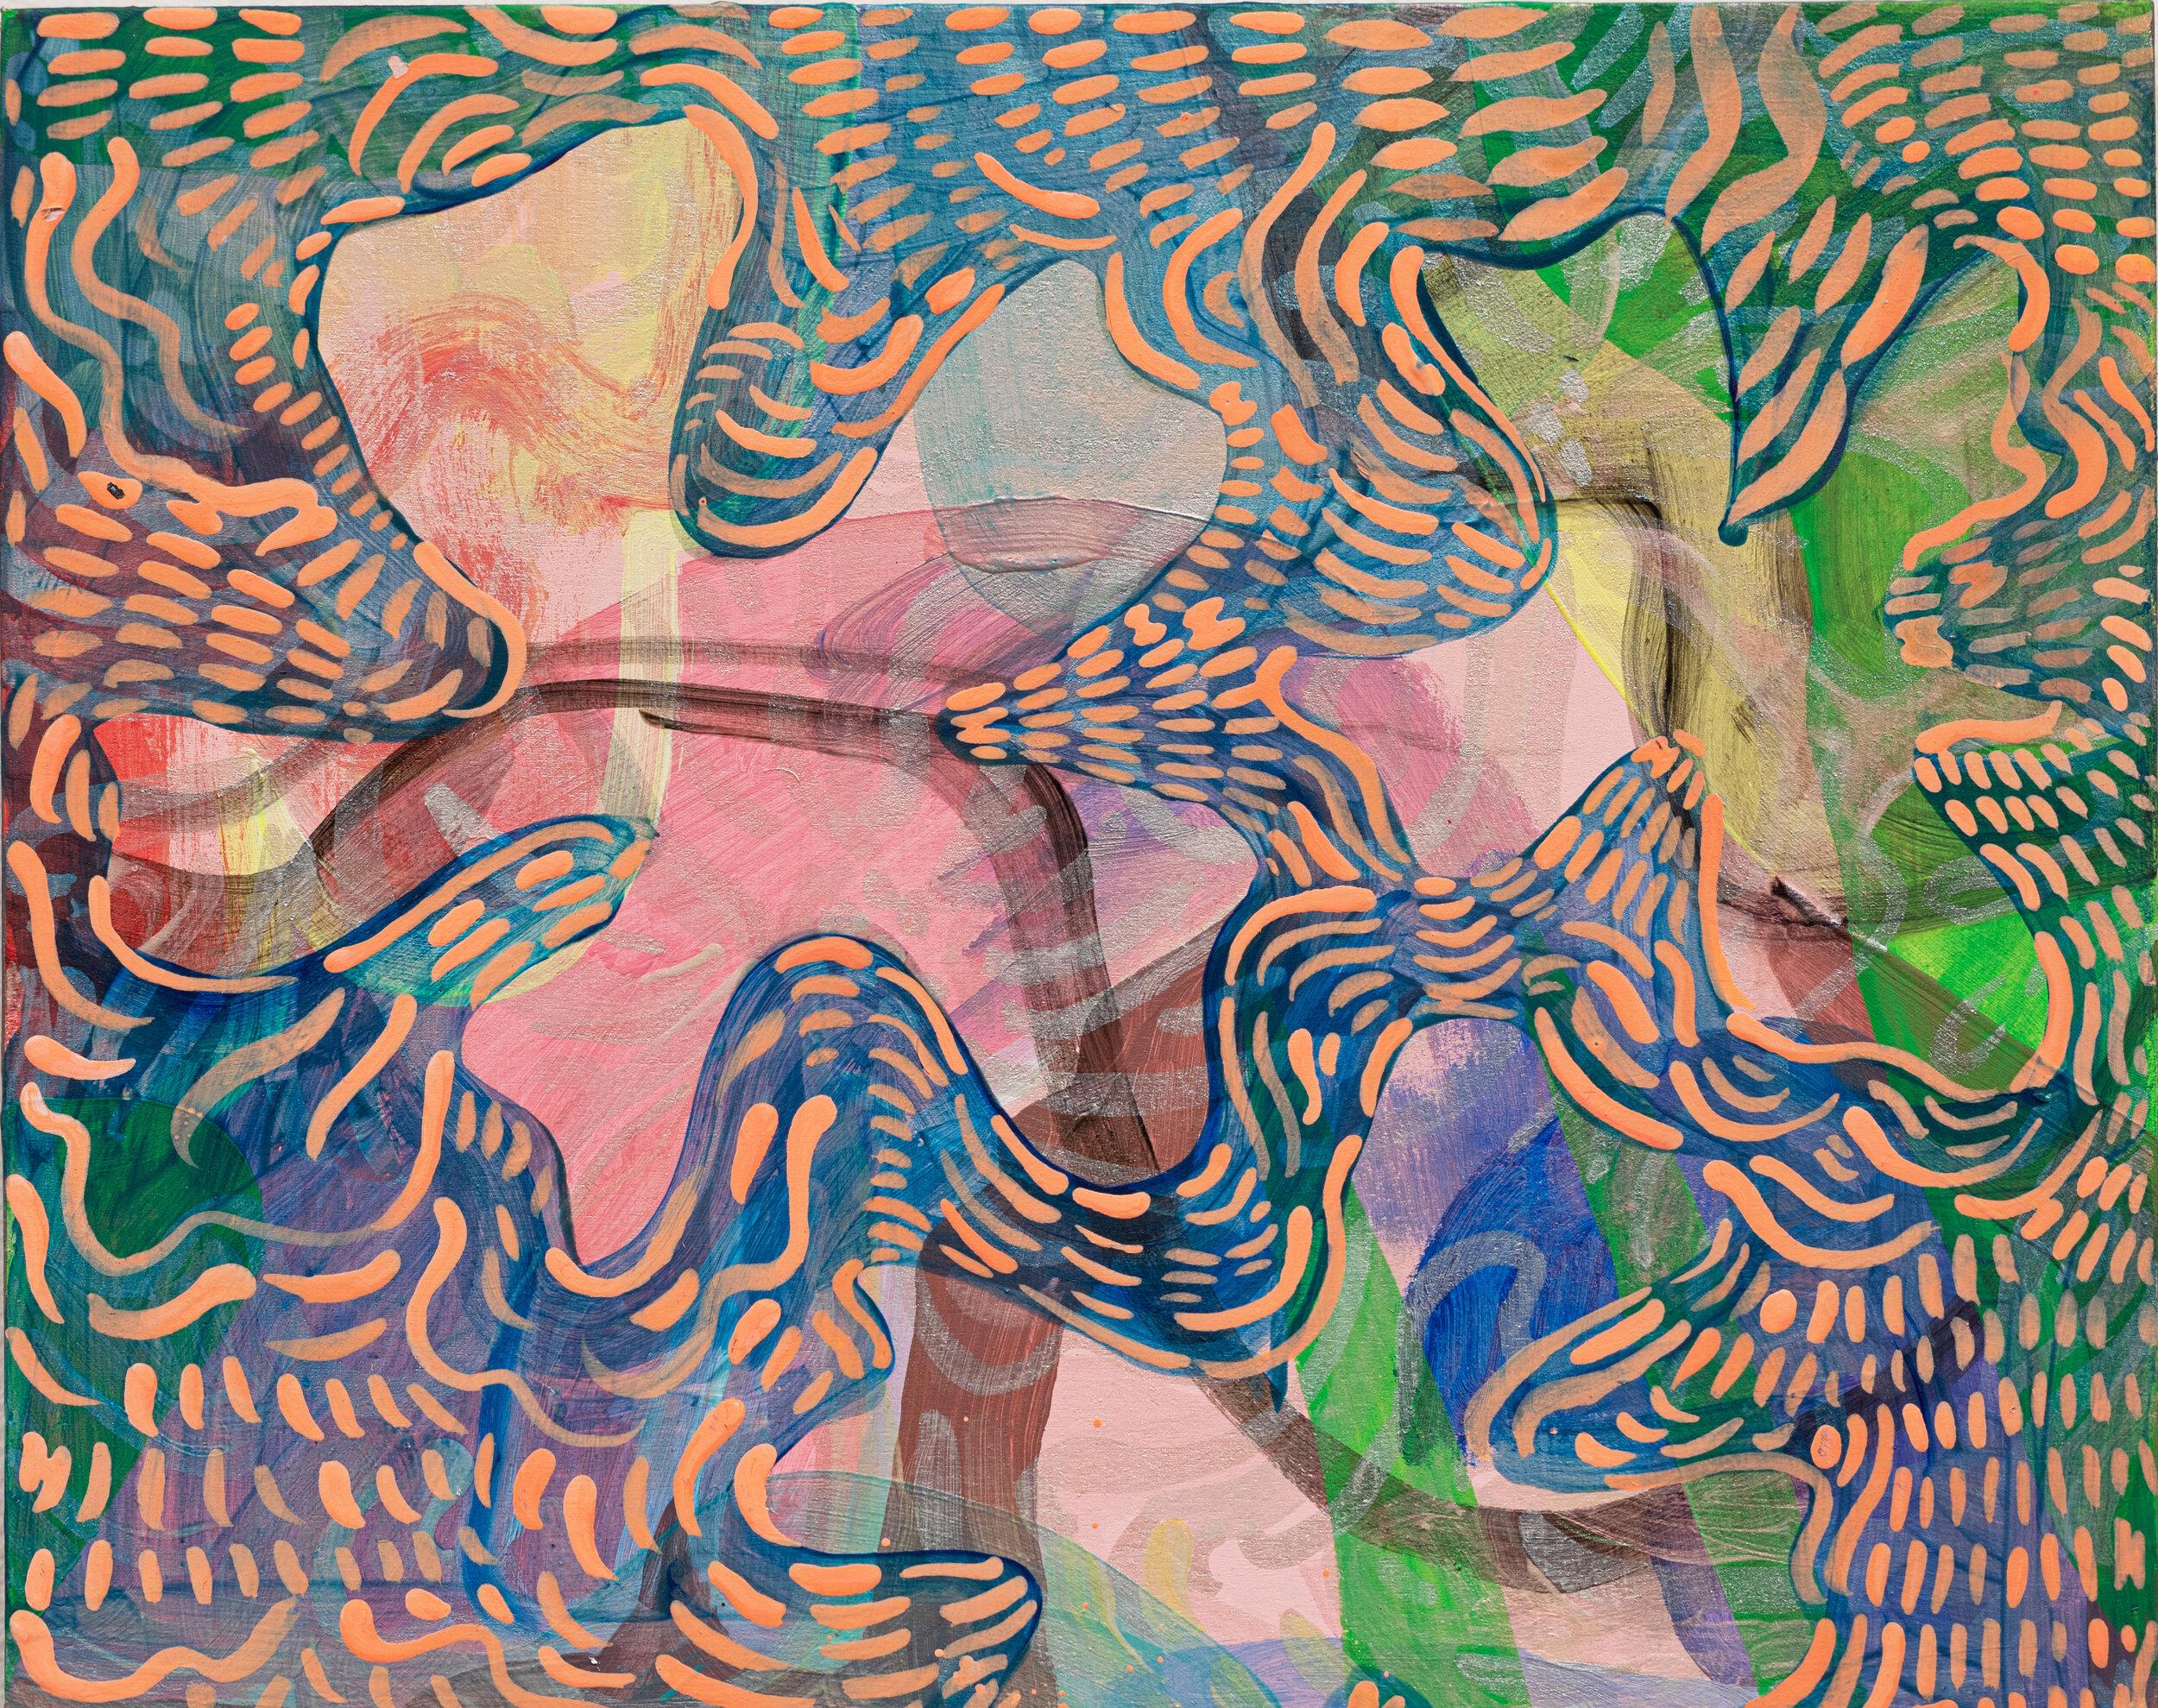 Wylie Garcia, Turning of the Season, 2019, Acrylic on Birch Panel, 8x10, 425.jpg